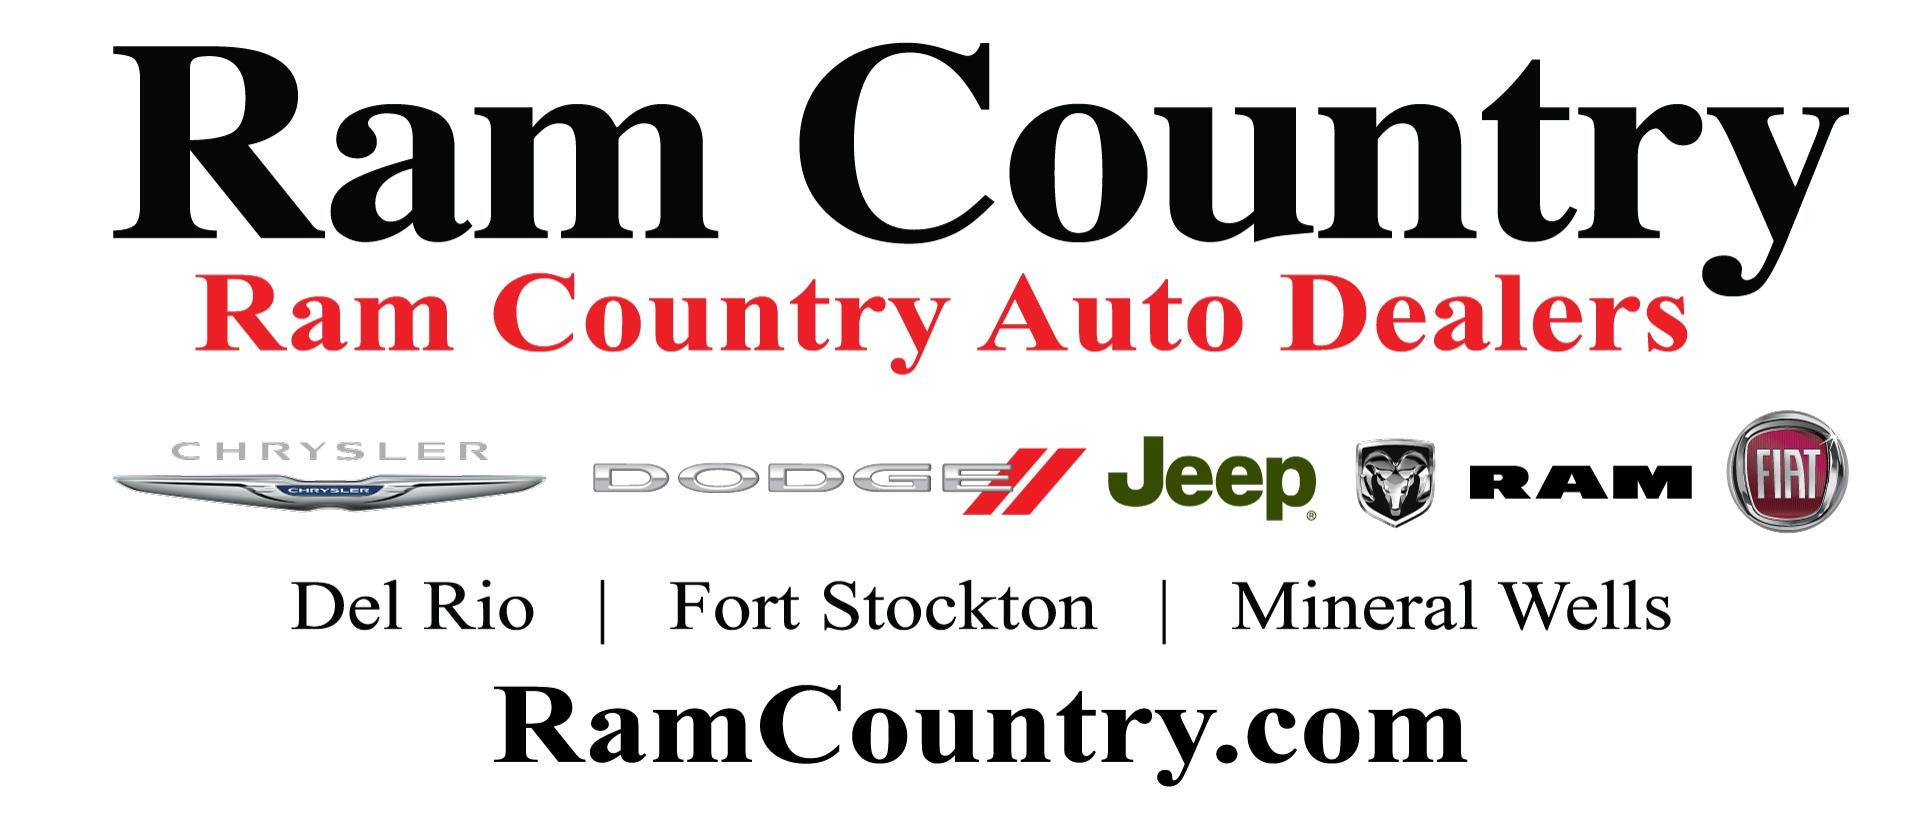 716e24fa9 Ram Country Chrysler Jeep Dodge Ram FIAT - Huge Selection